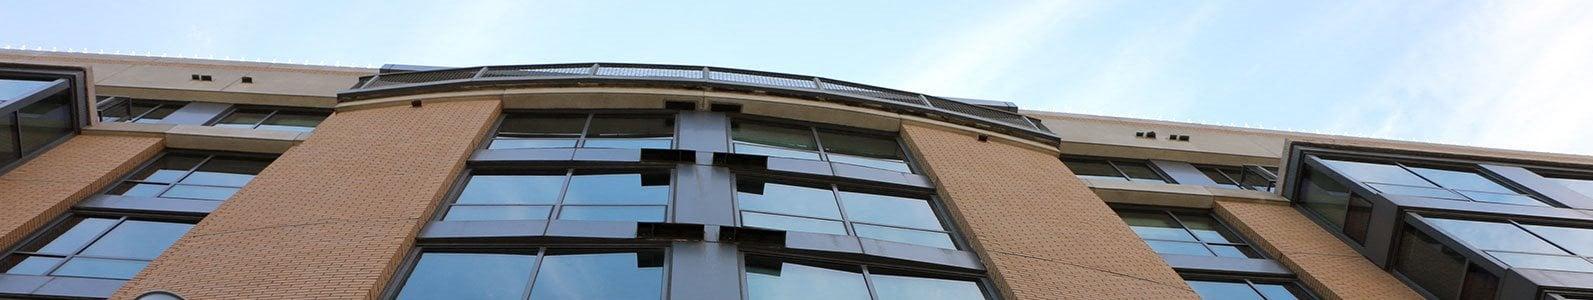 Midtown-Crossing-Apartments-Omaha-NE-68131-exterior-banner